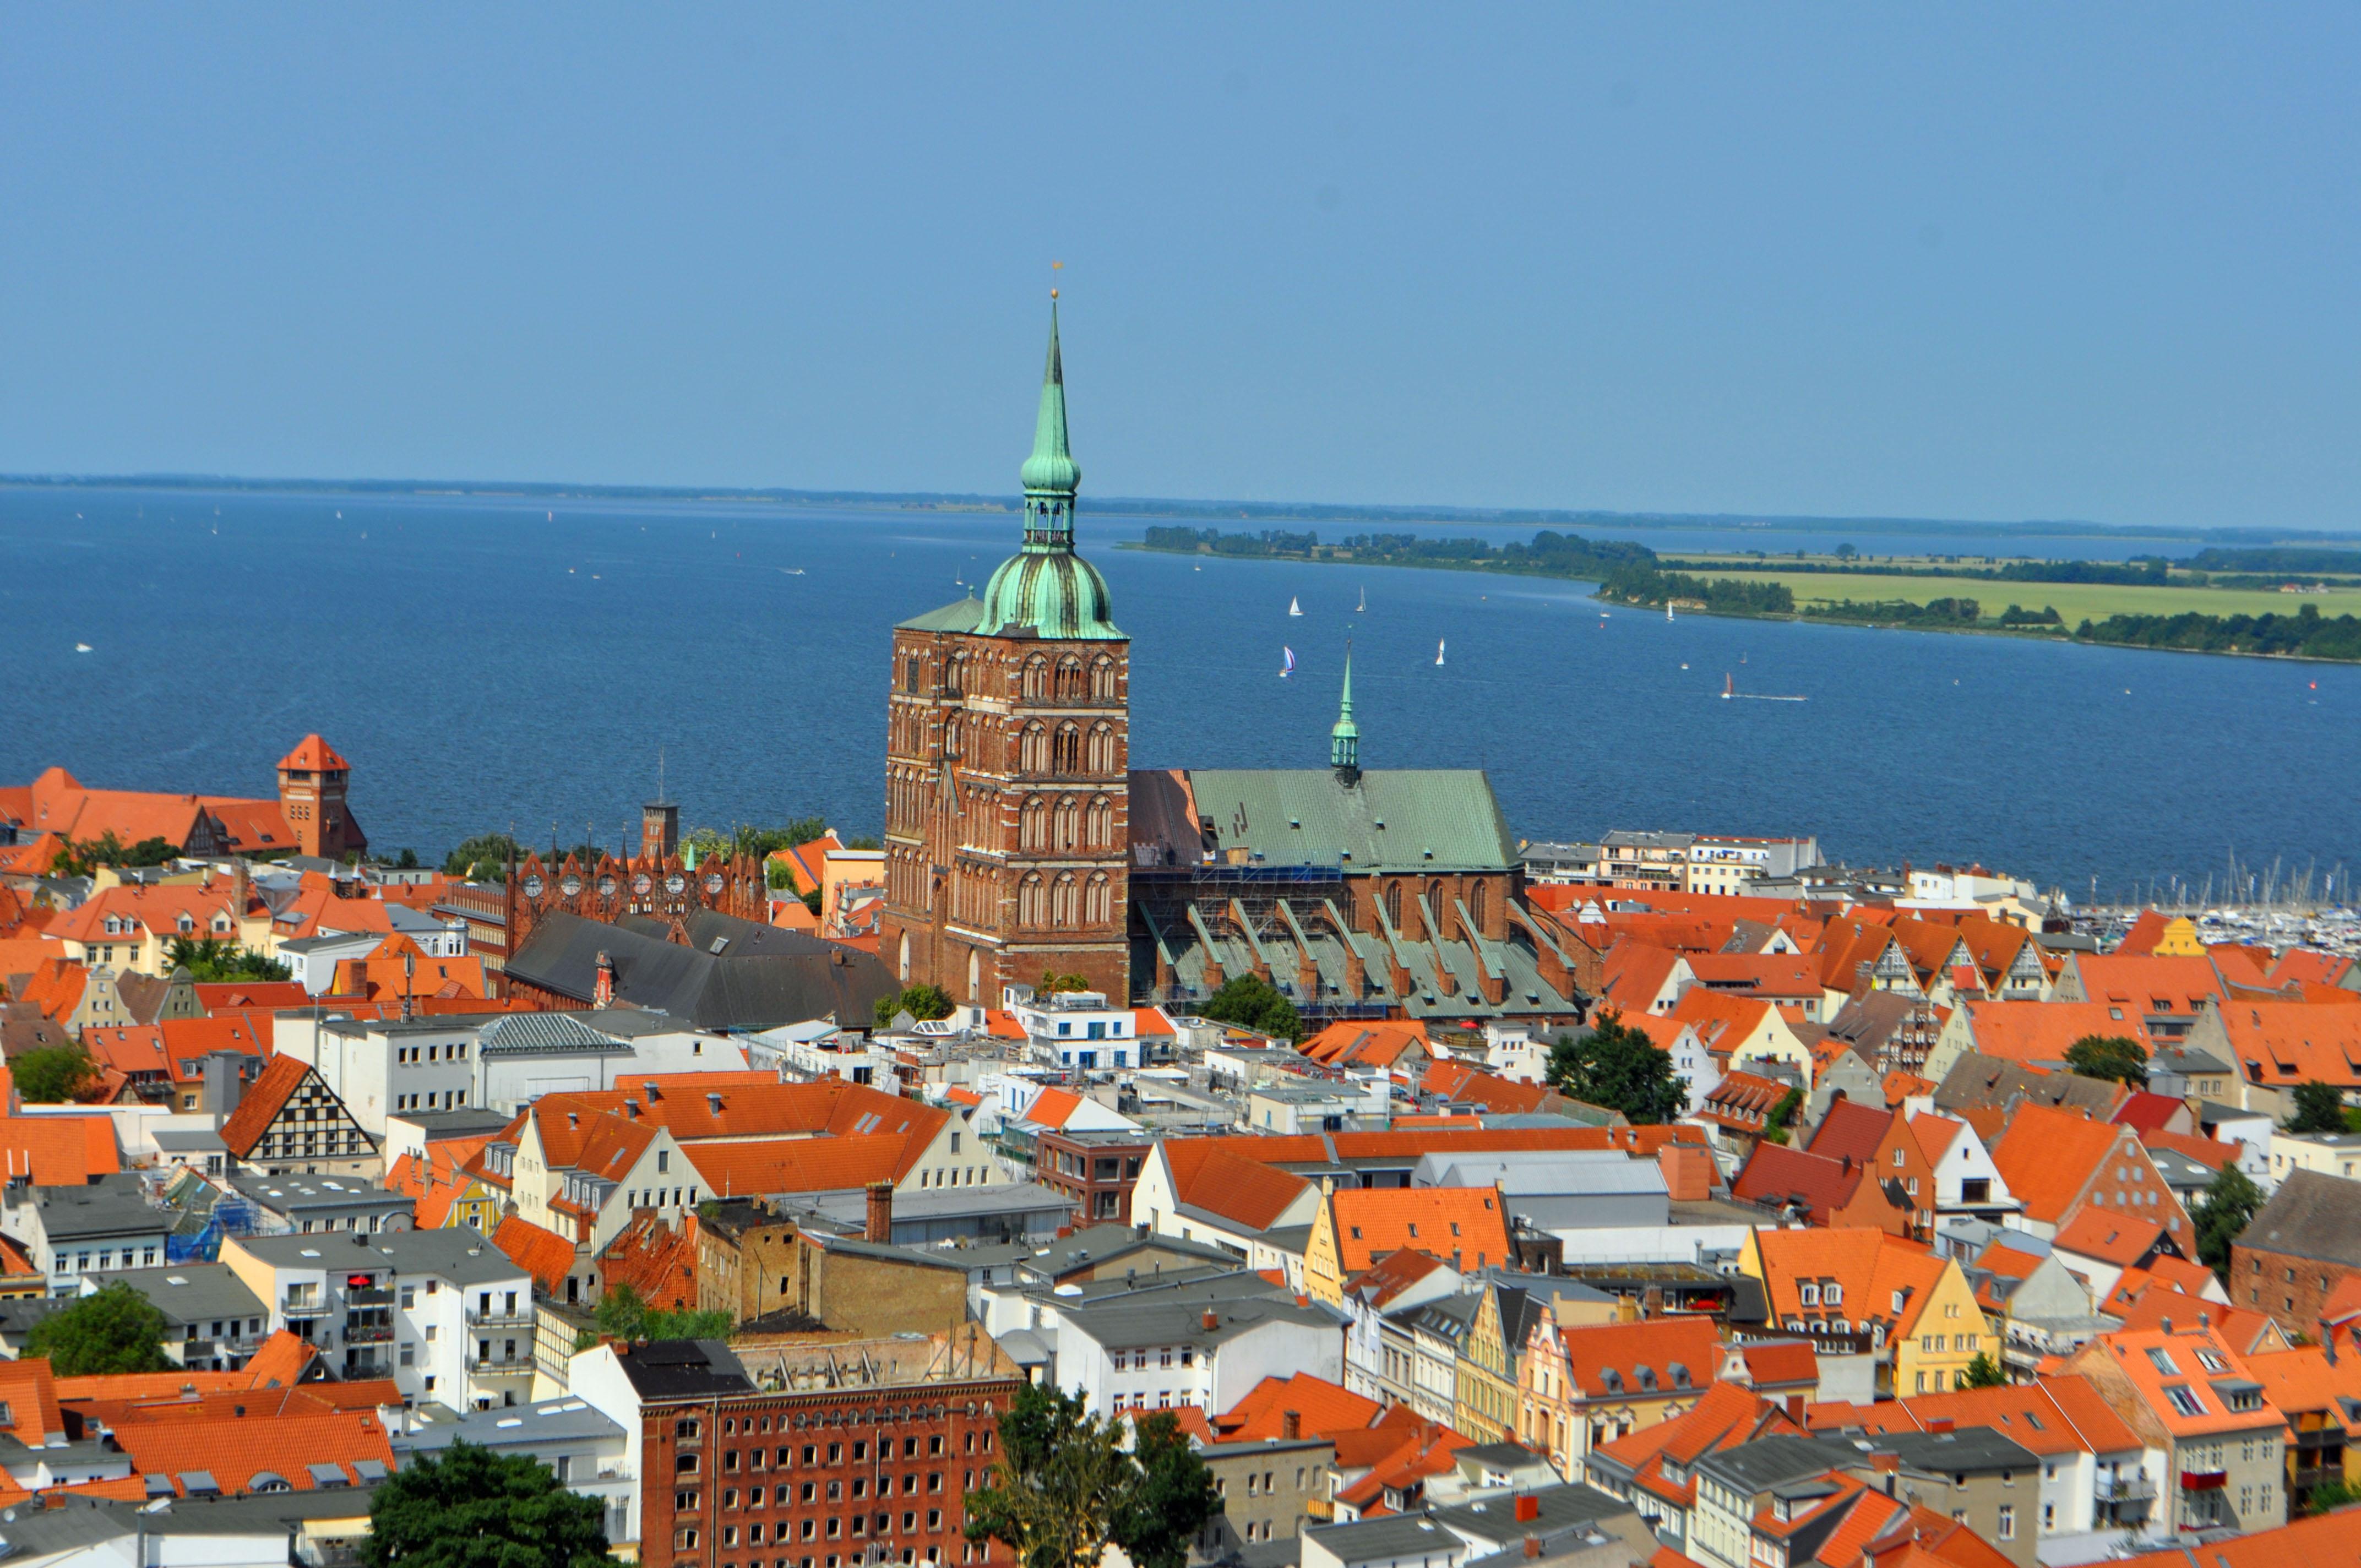 Huren aus Demmin, Hansestadt